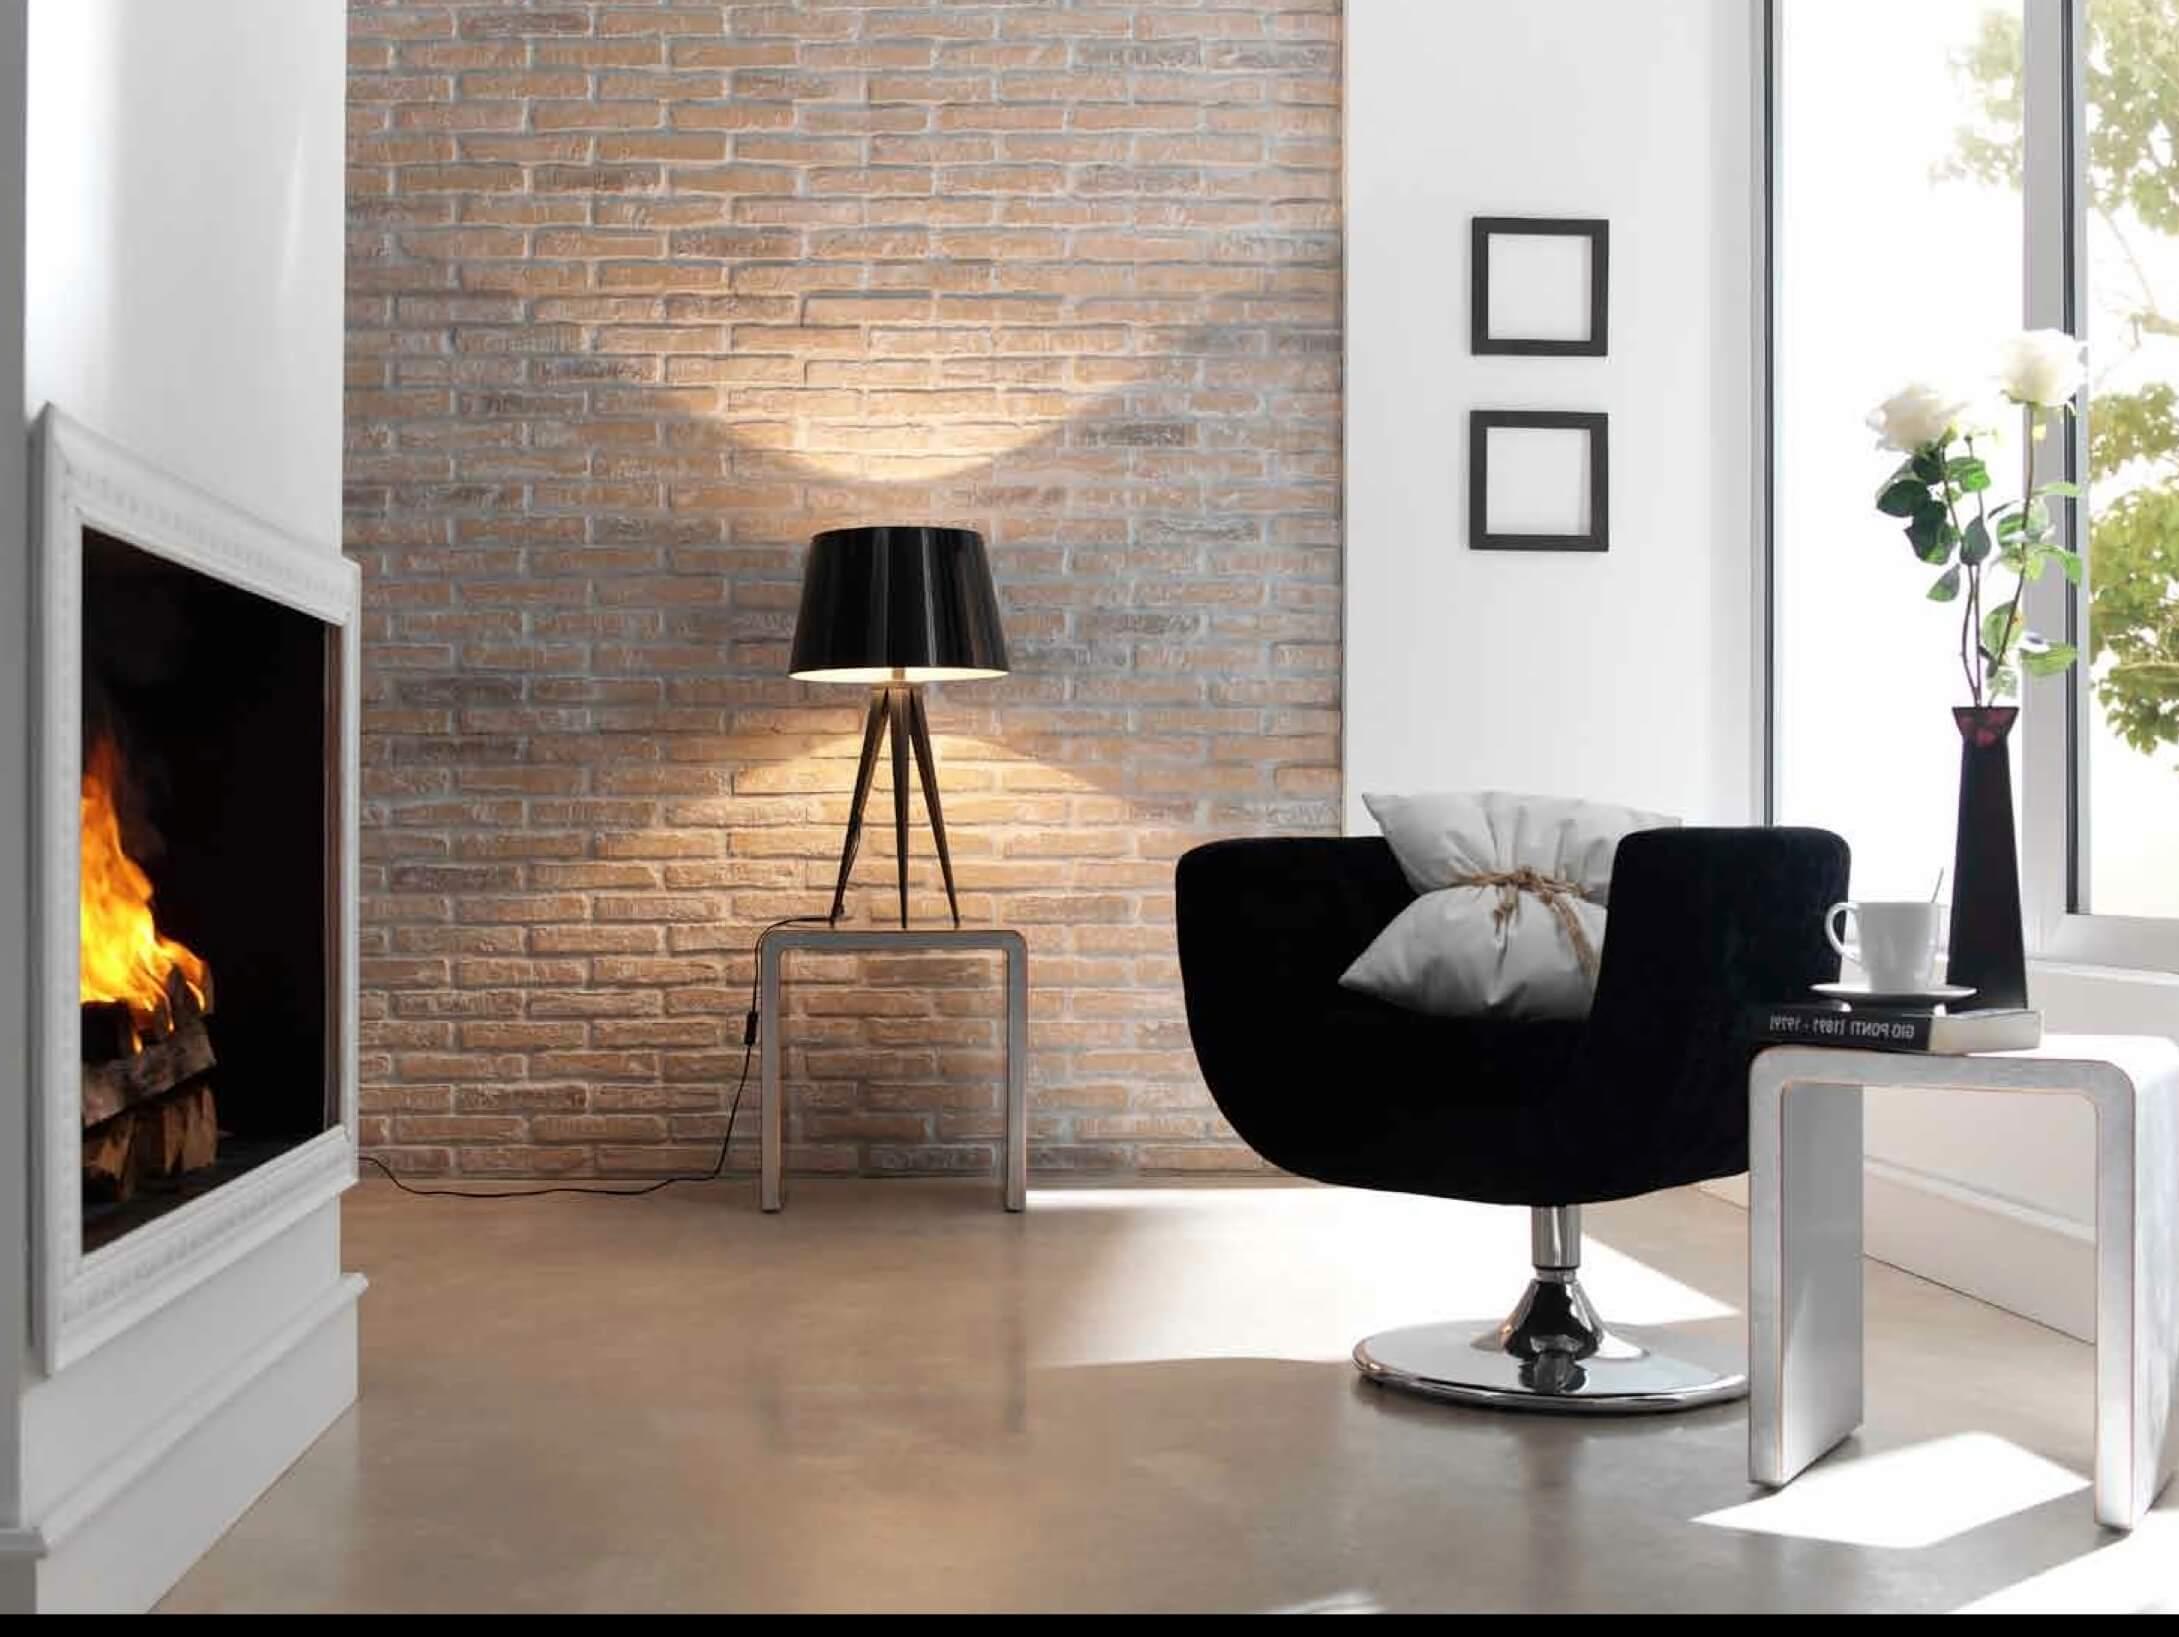 Brick provides a classy interior choice